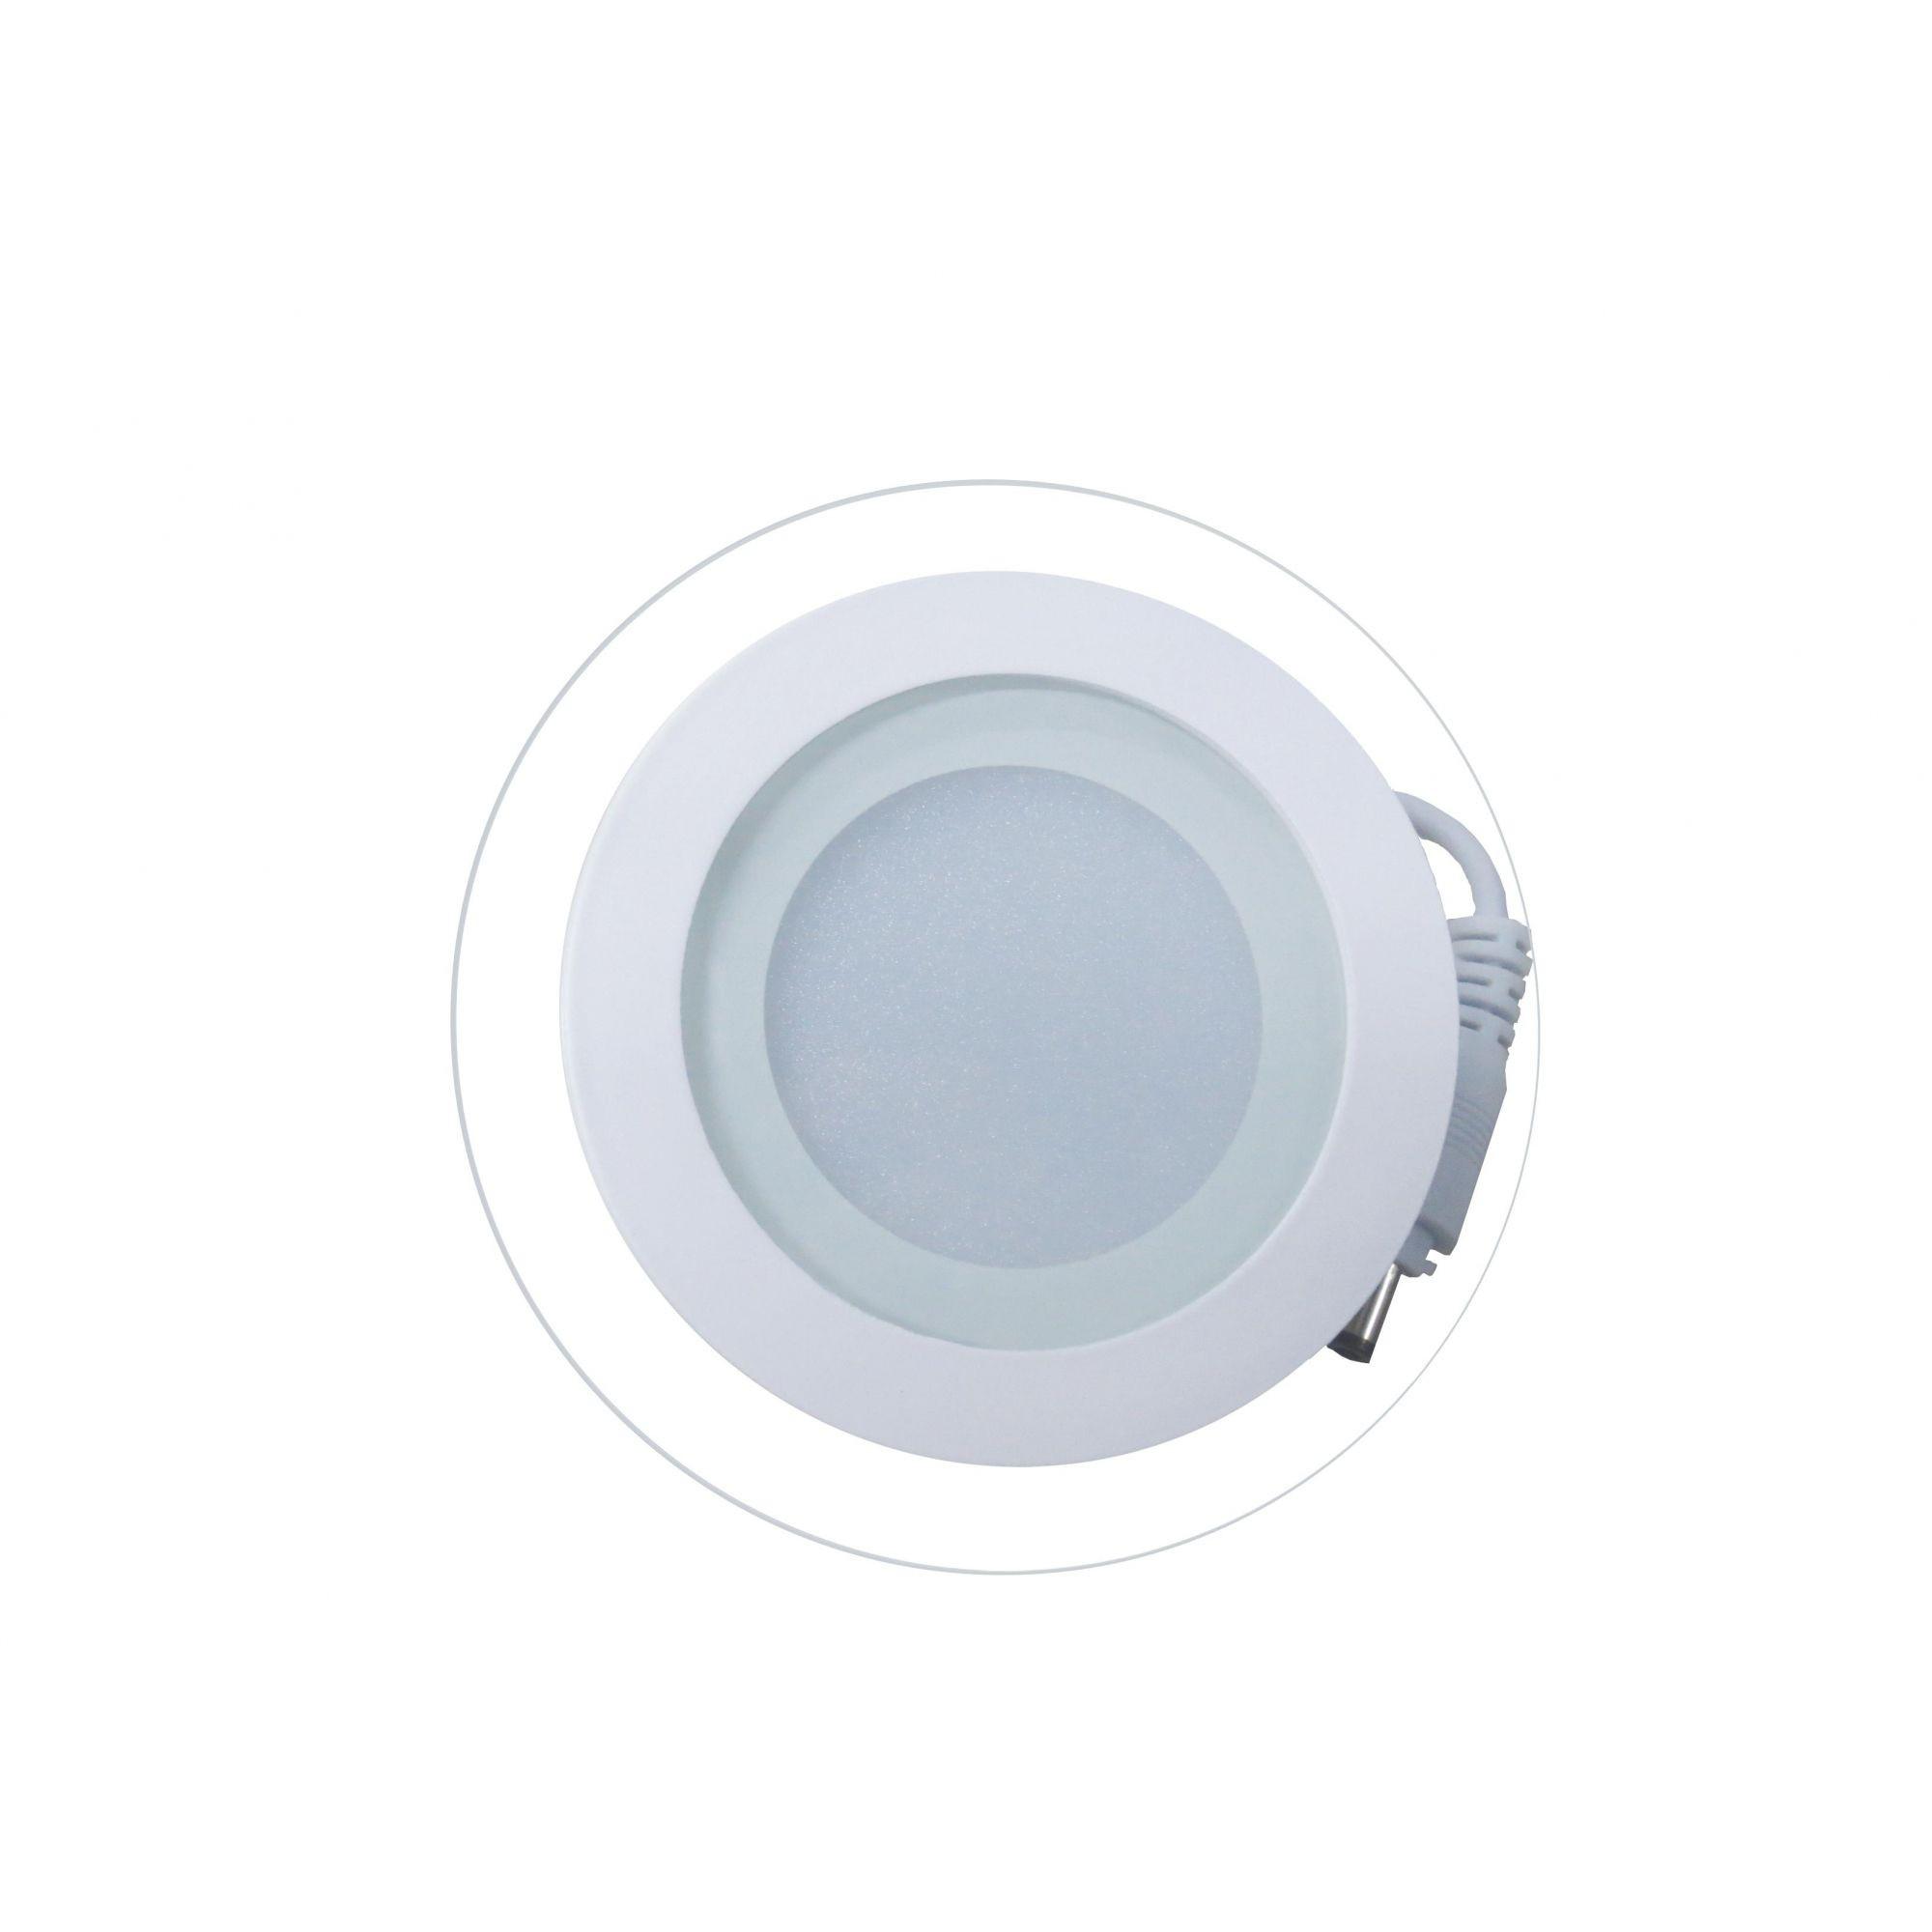 Luminária Led Redonda de Embutir MBLED - 6W